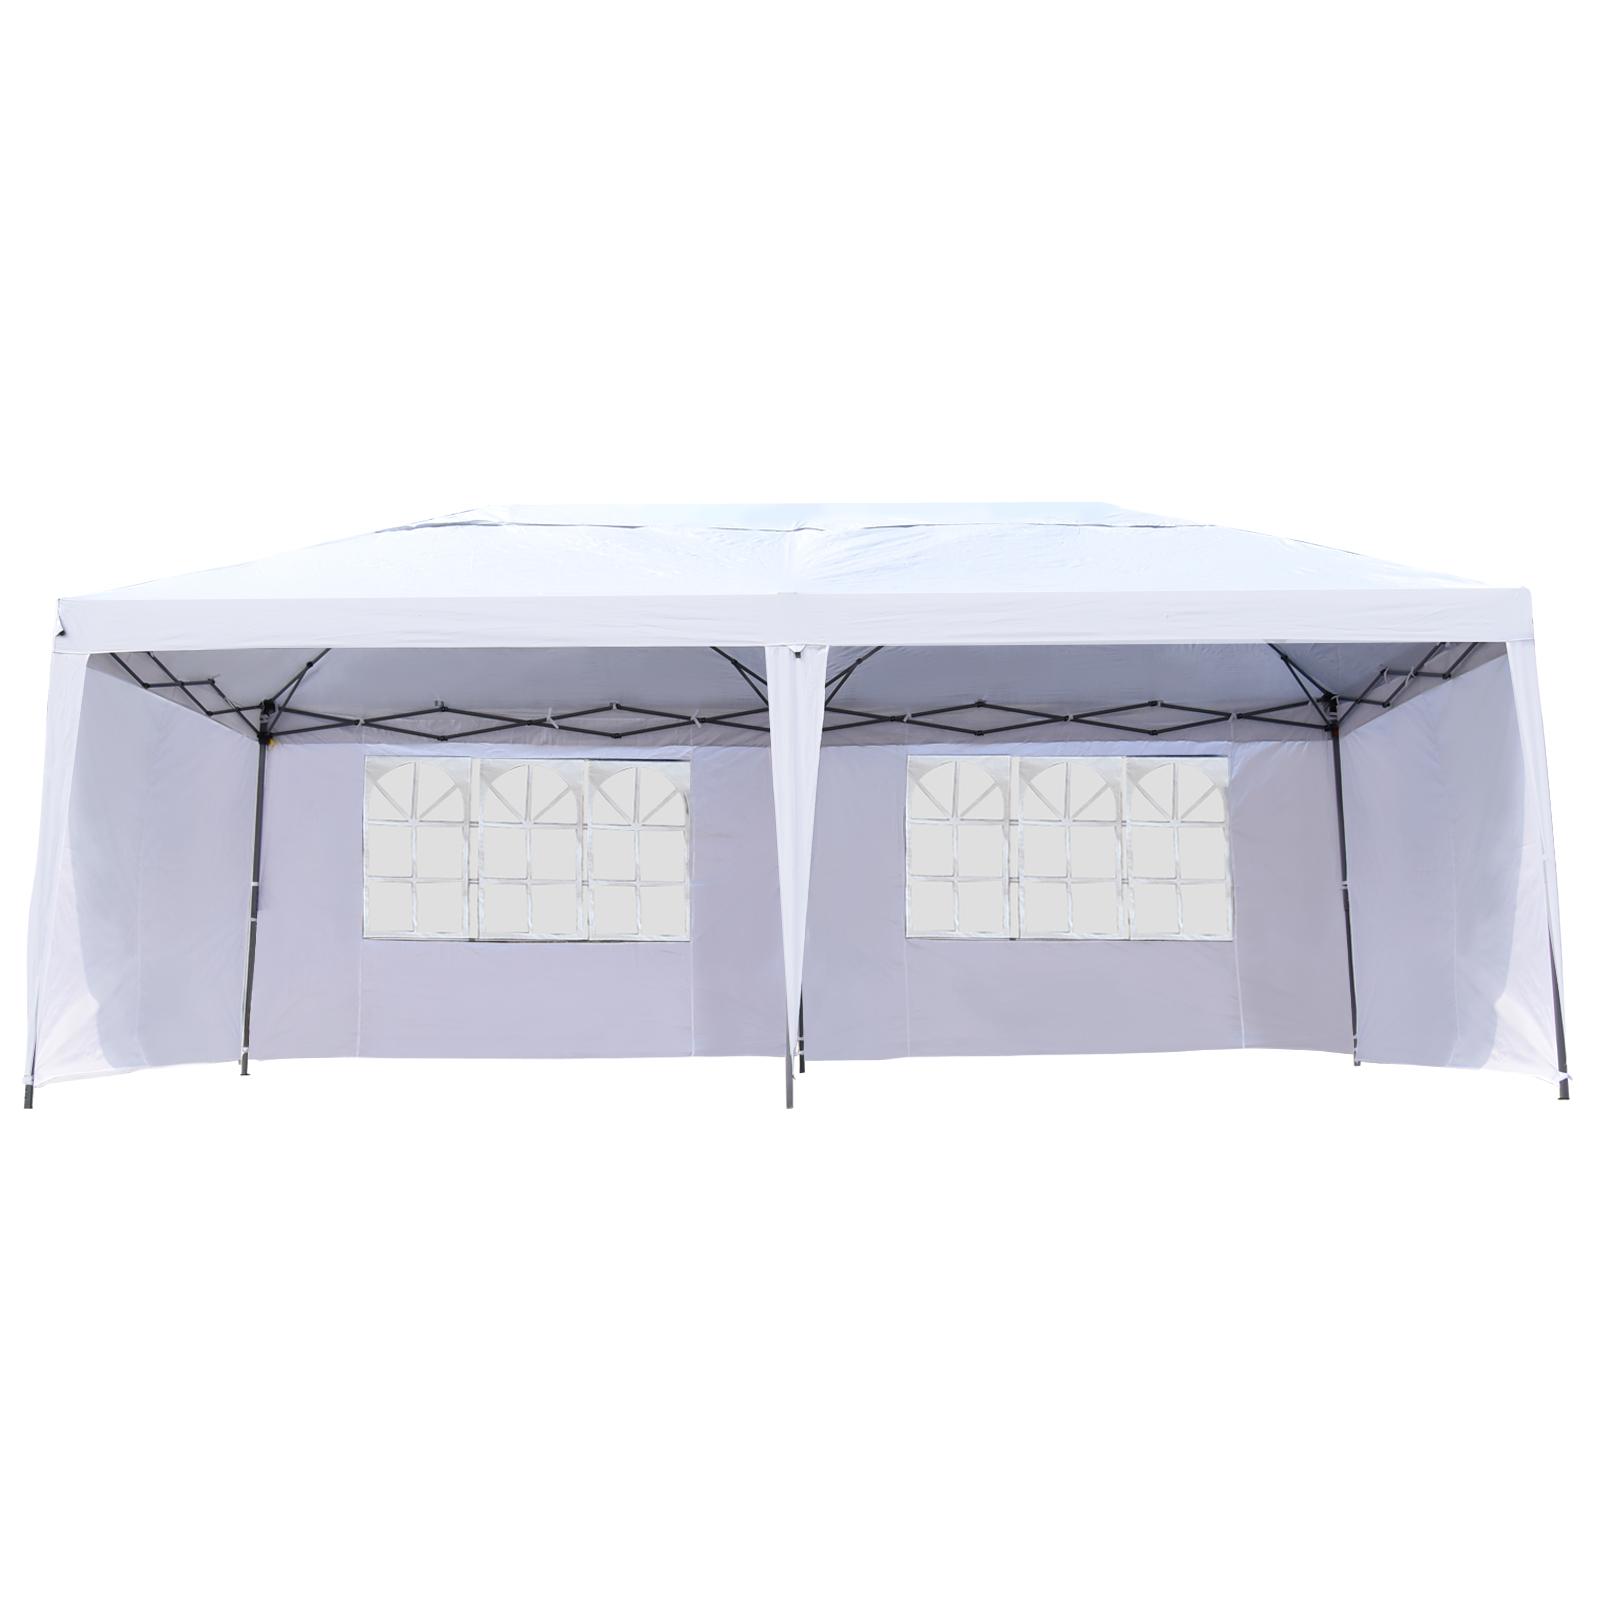 Outdoor-10-039-x20-039-EZ-POP-UP-Gazebo-Wedding-Party-Tent-Canopy-Folding-w-Carry-Bag thumbnail 46